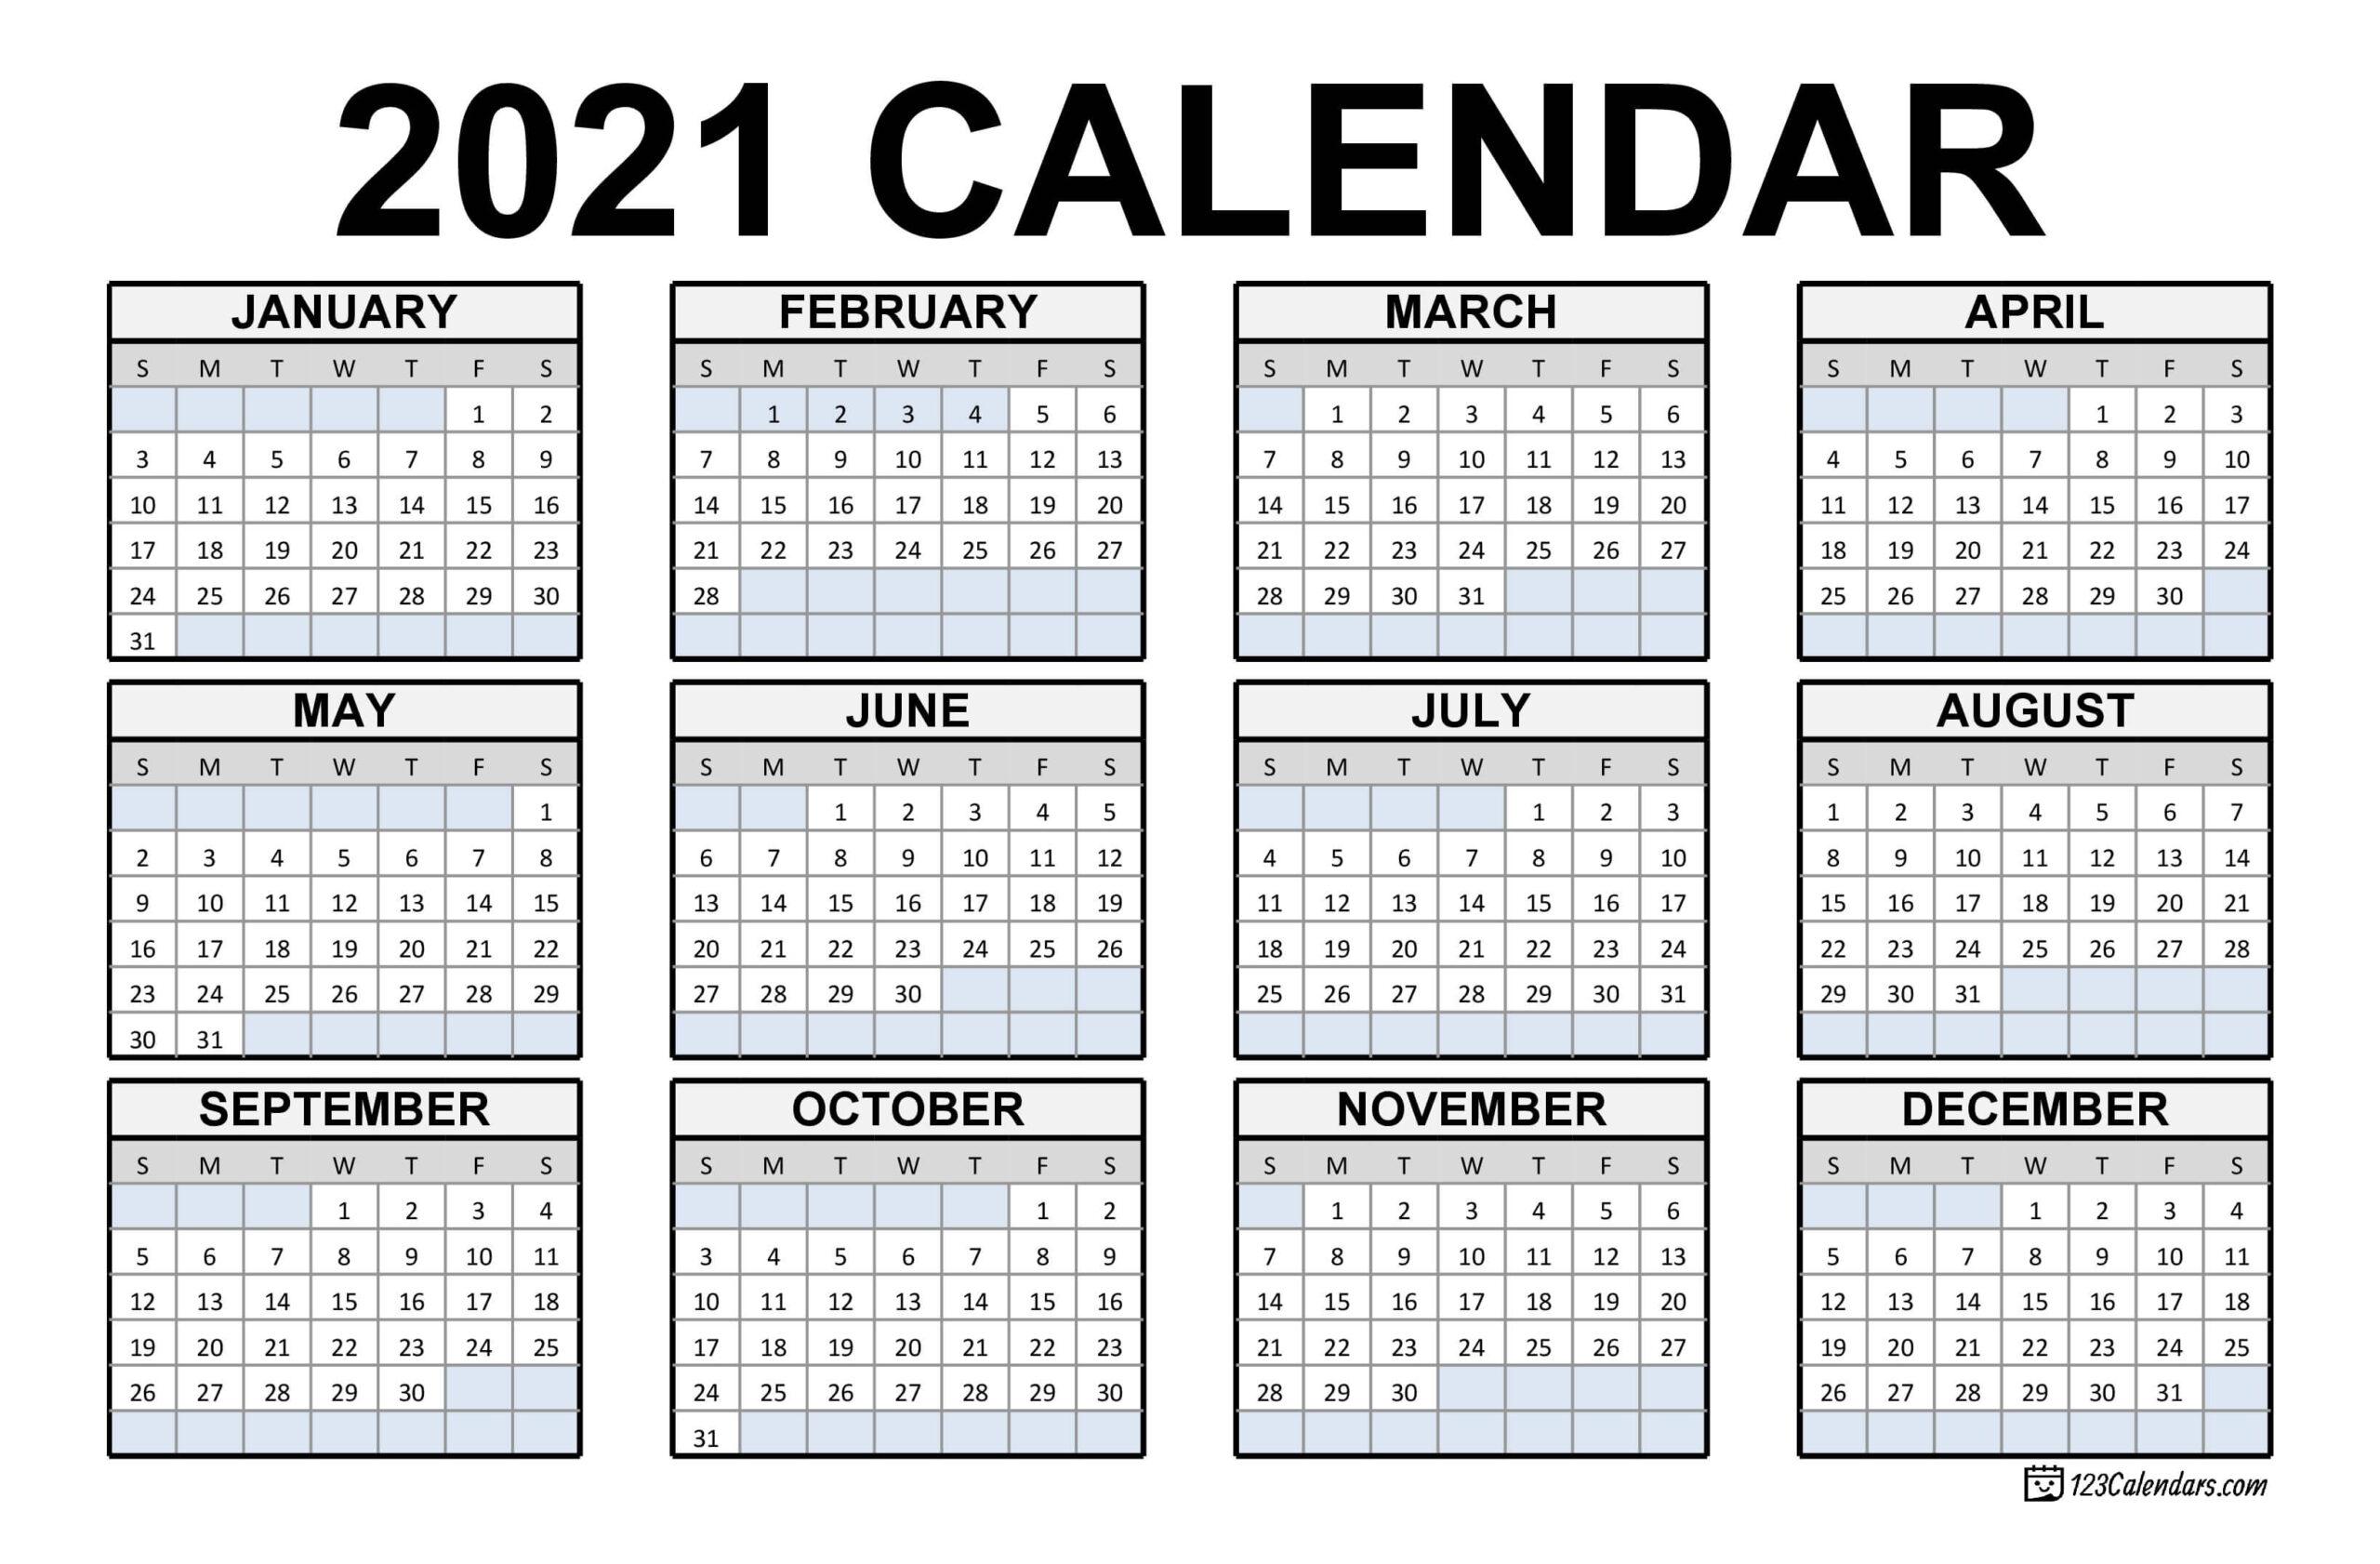 2021 Printable Calendar | 123Calendars inside 2021 Calendar To Fill In